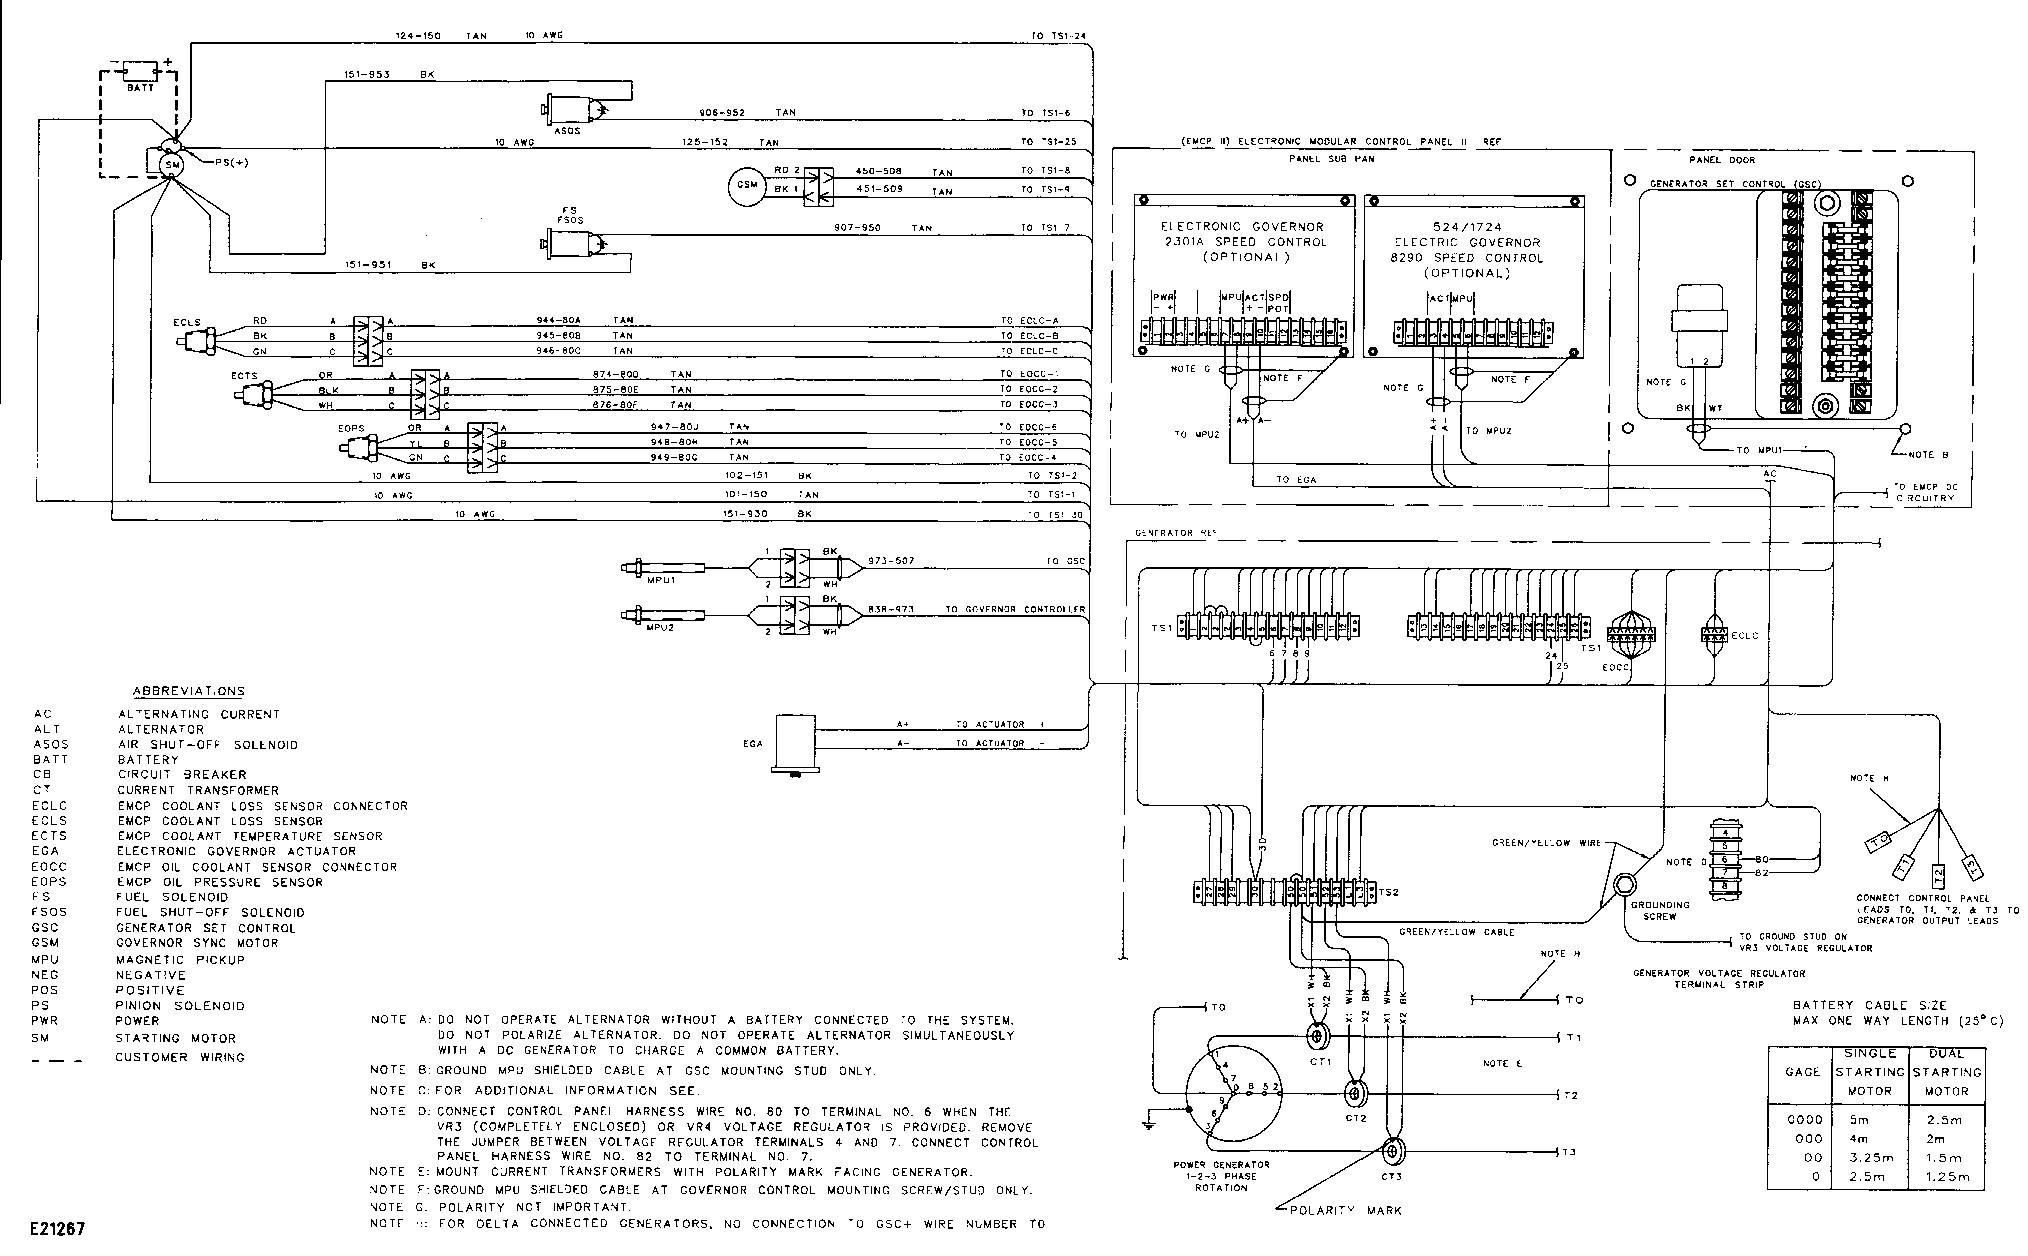 wire diagram cat c15 today wiring diagram Caterpillar C15 Parts Diagram c18 cat ecm pin wiring diagram caterpillar c15 diagram hight resolution of c15 acert injector wiring